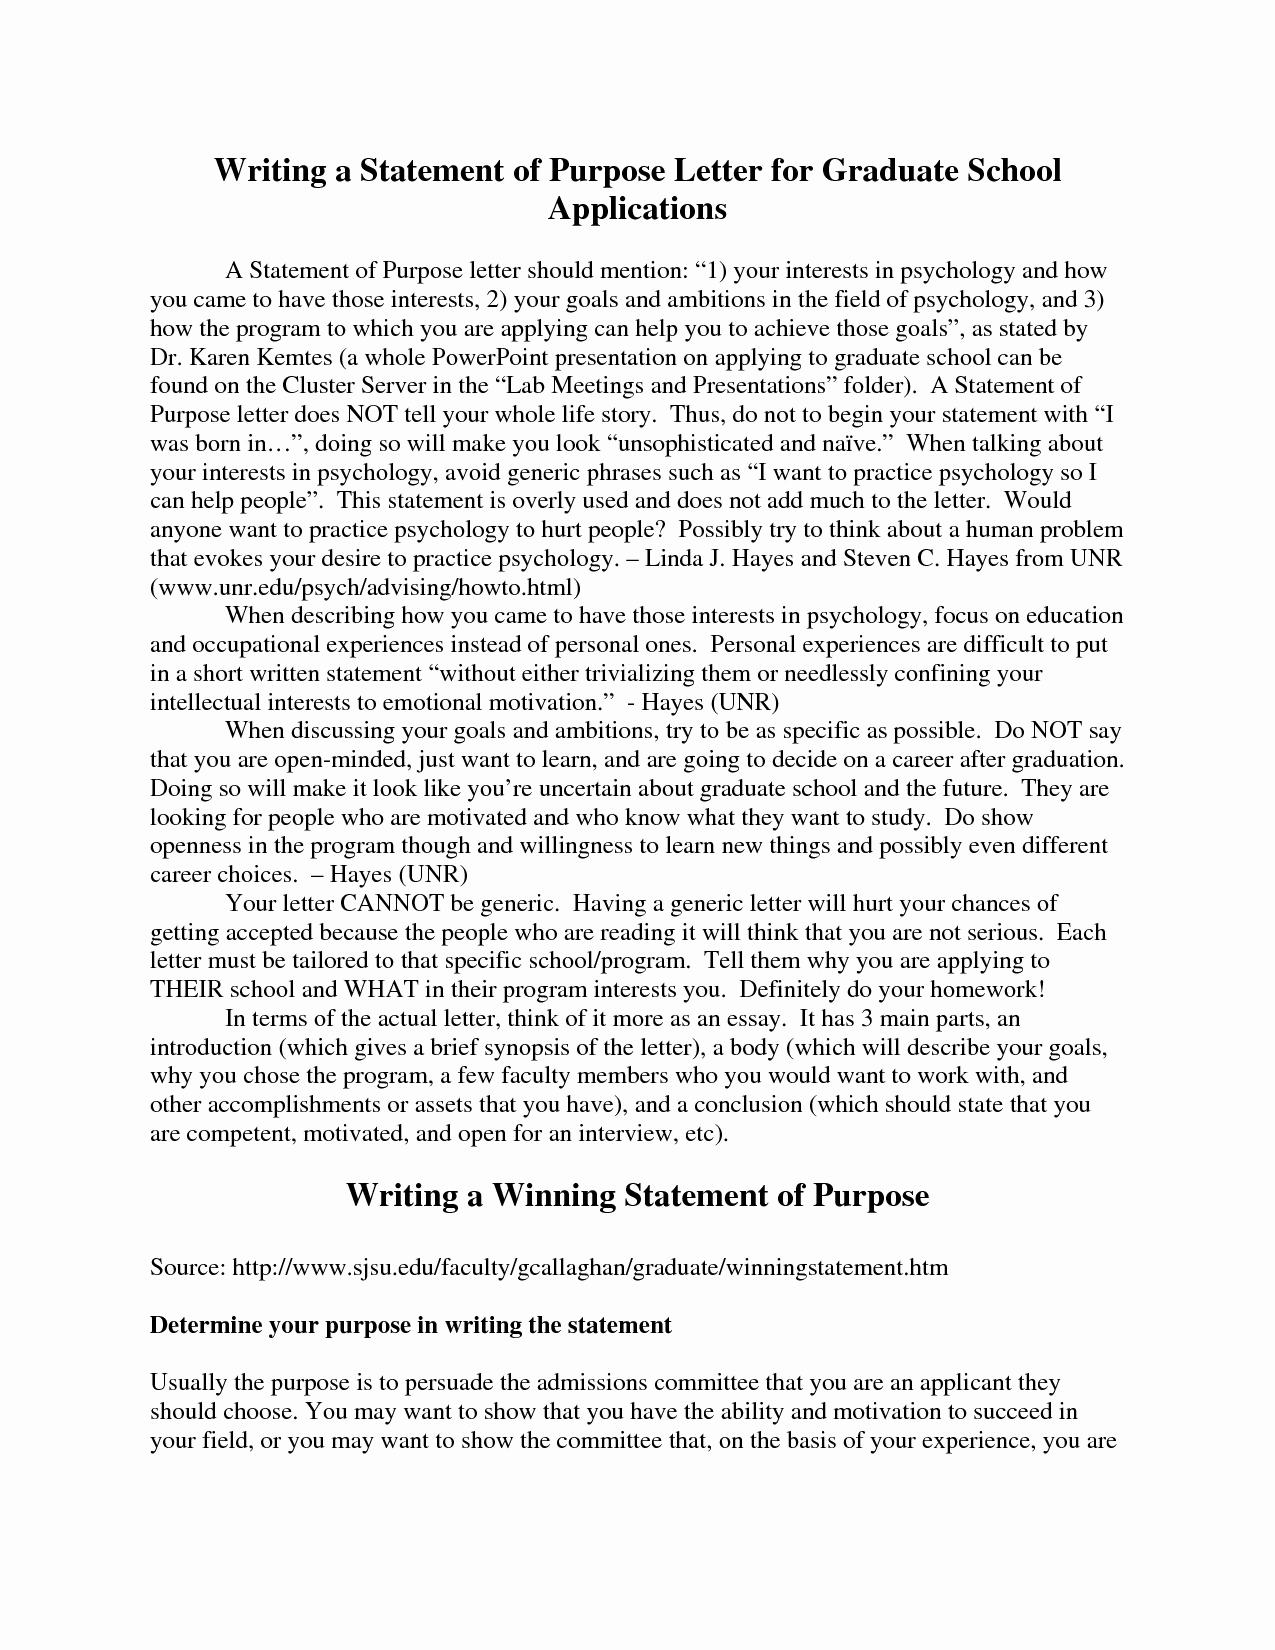 Personal Goal Statement format Unique Goal Statement for Nurse Practitioner Graduate School